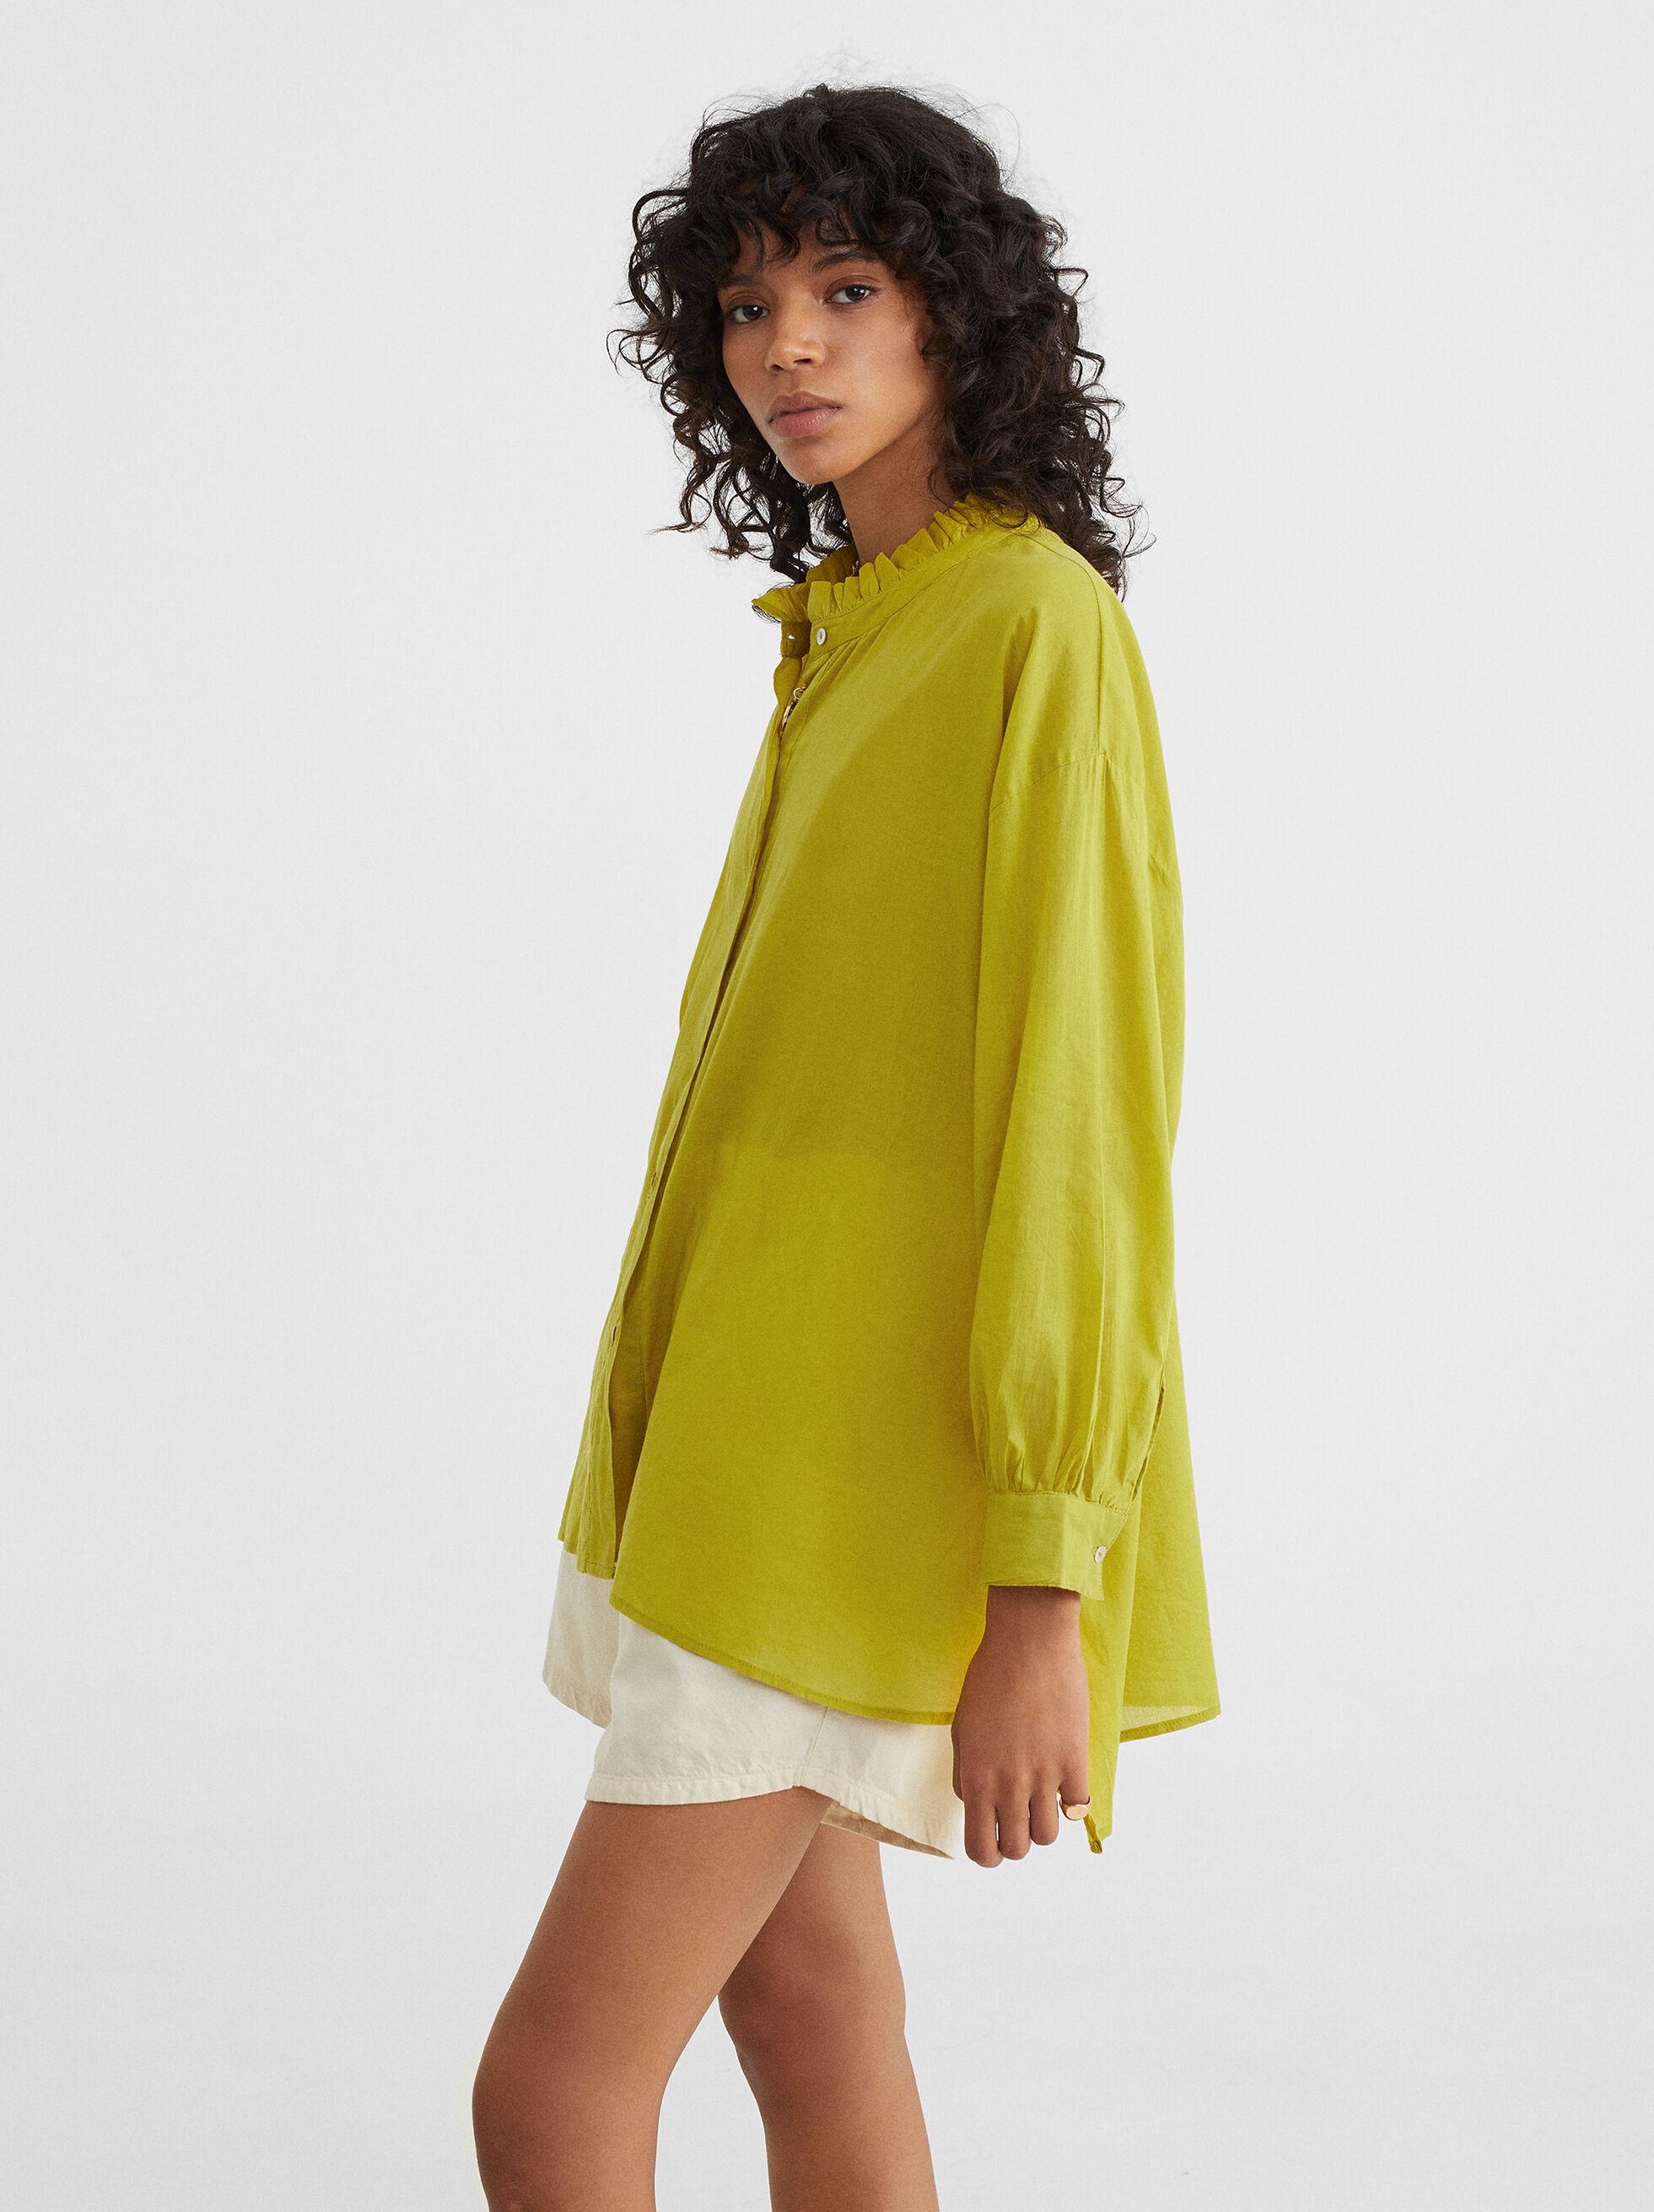 Frilled Stand-Up Collar Shirt, Green, hi-res